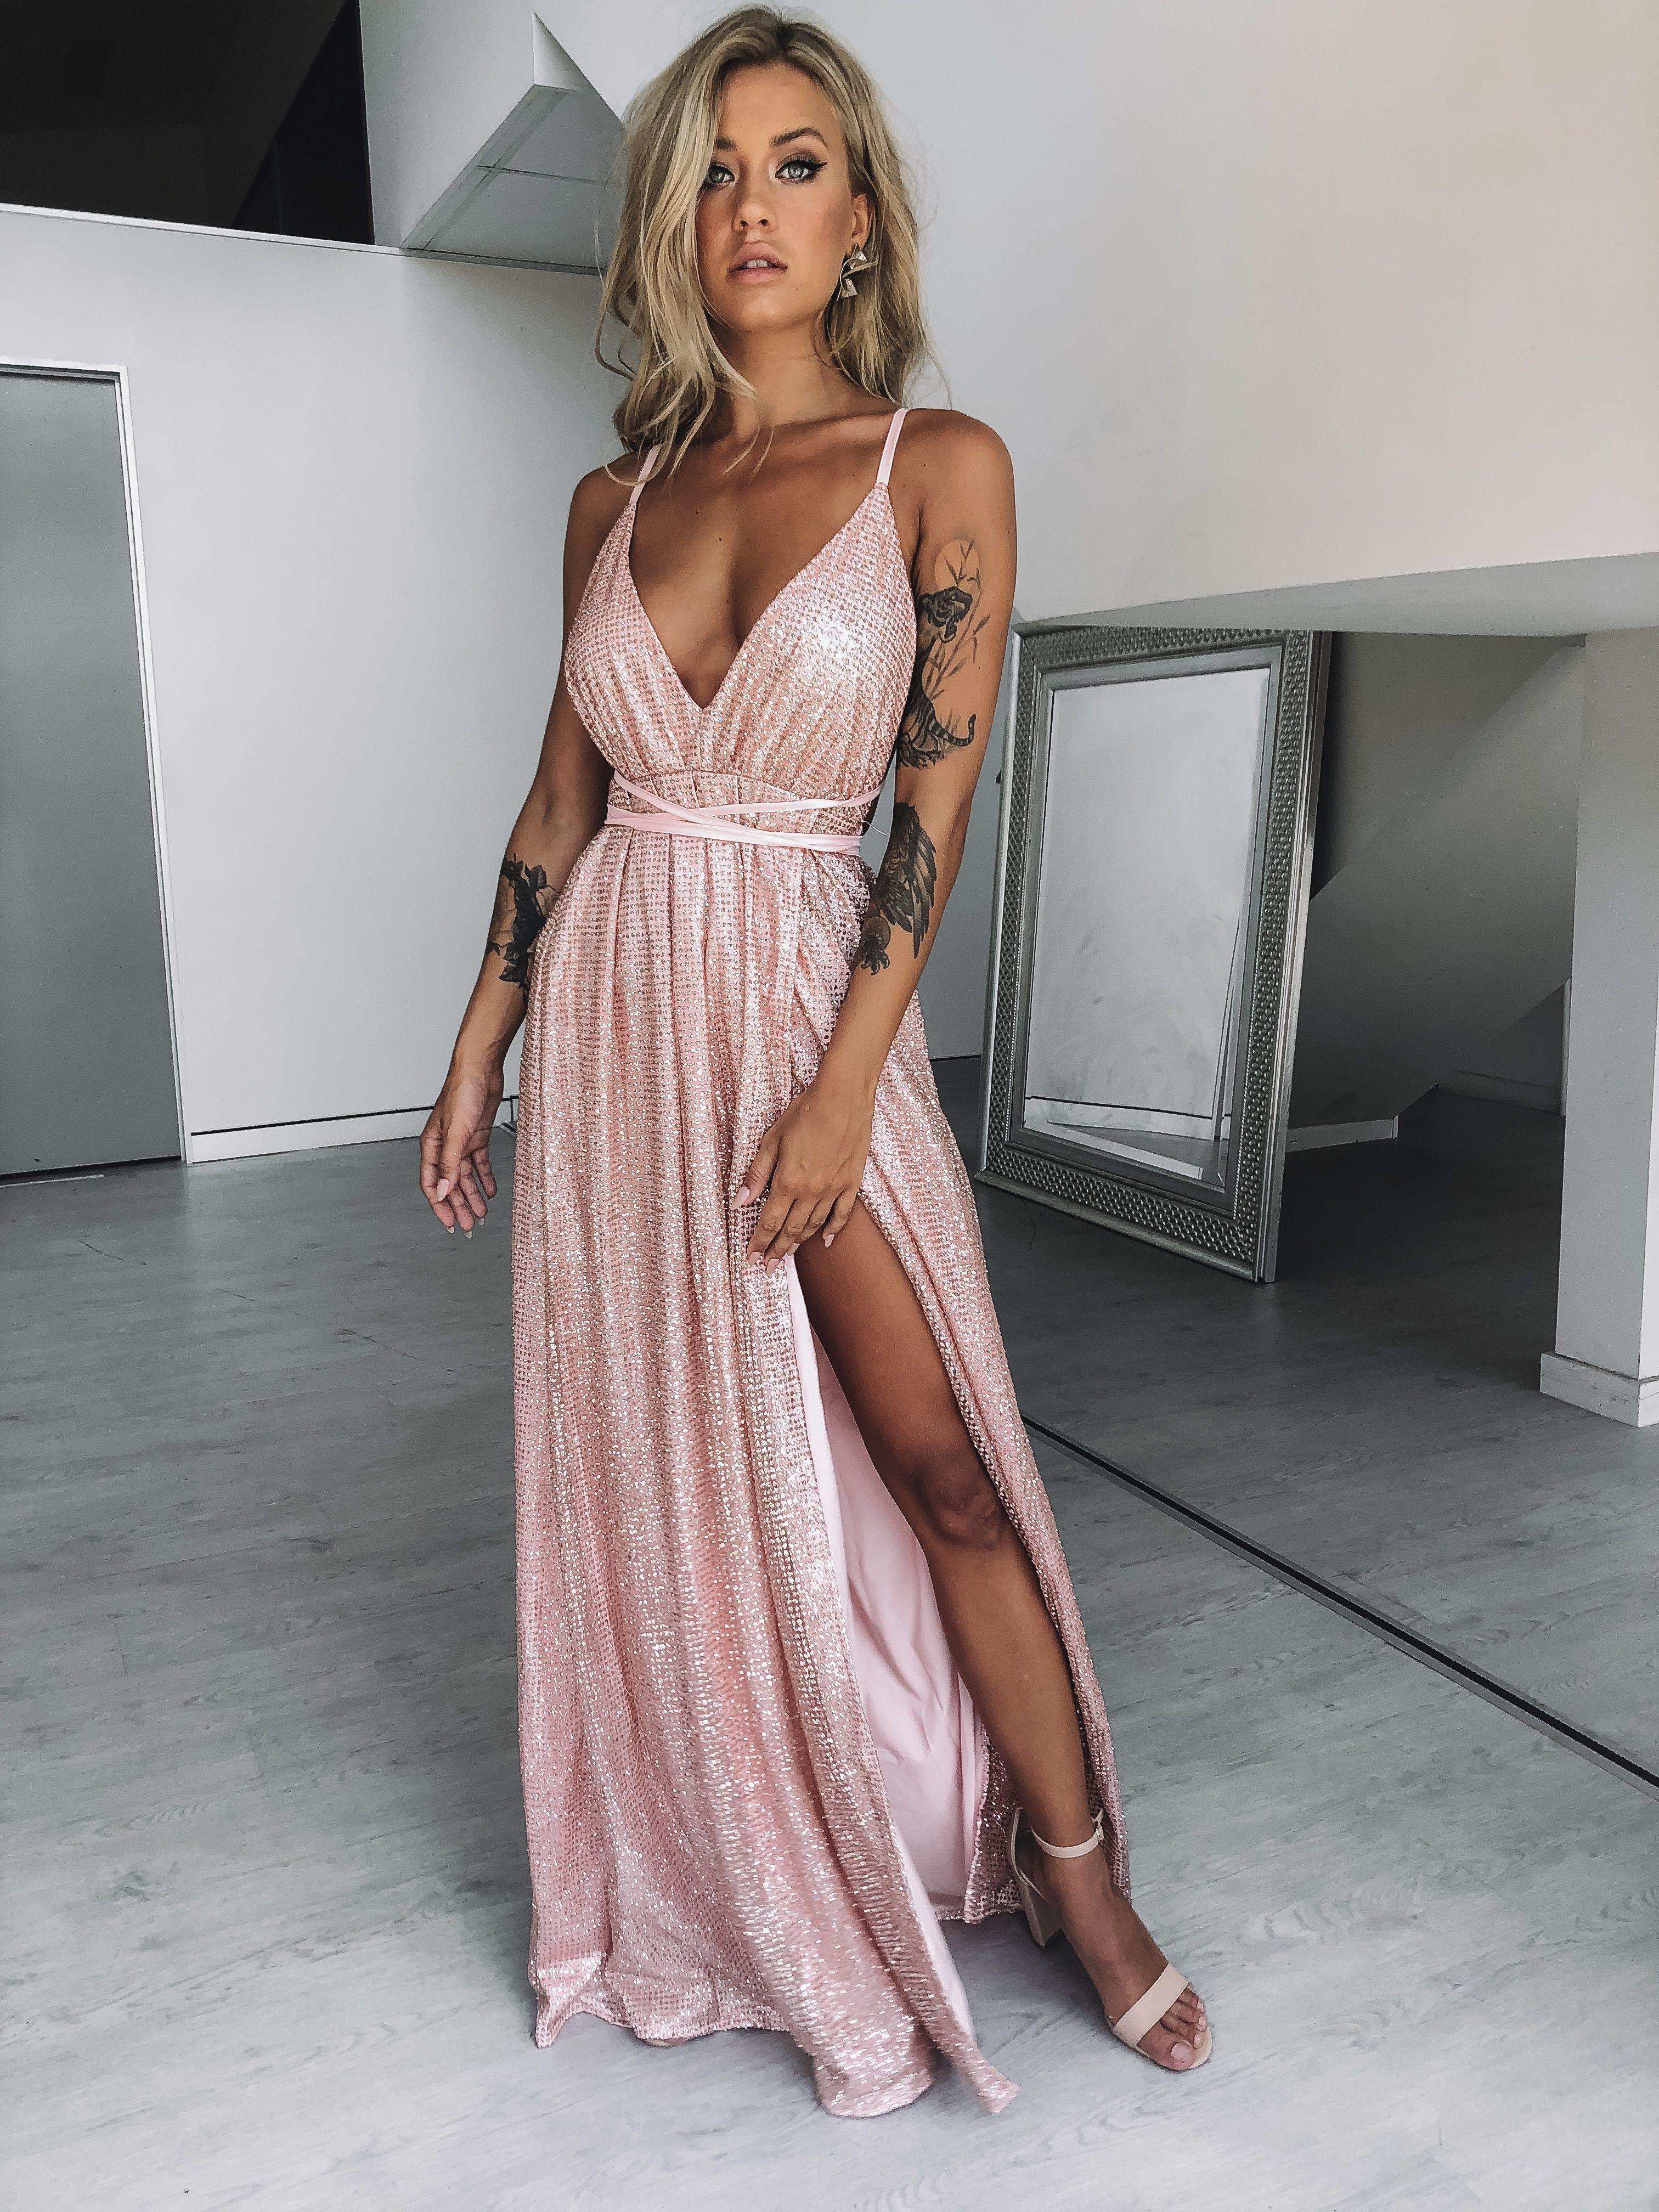 Rose Gold Glitter Prom Dress Em 2019 Vestido Longo